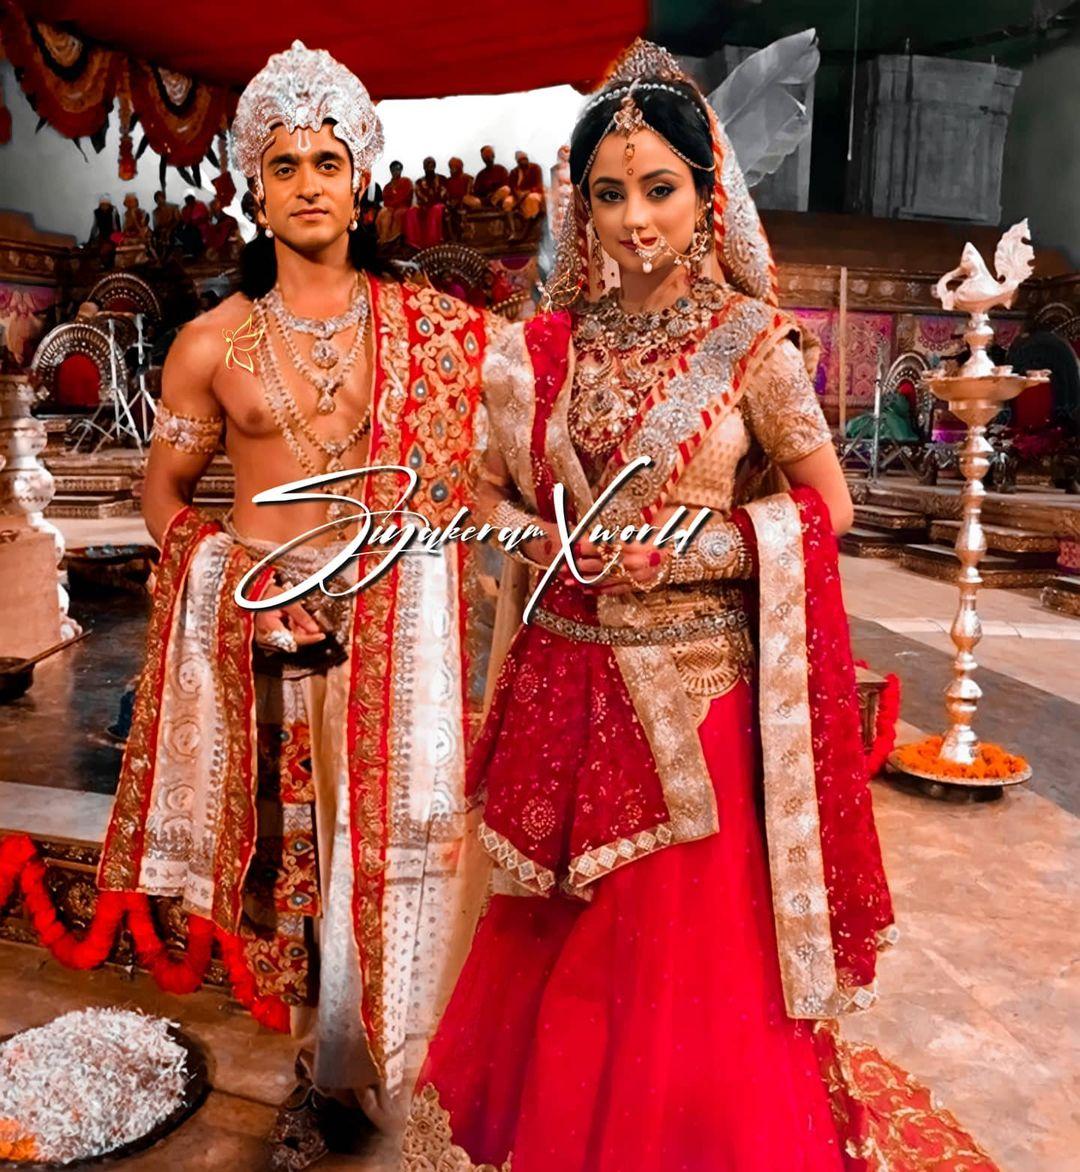 Siya Ke Ram Romantic Images